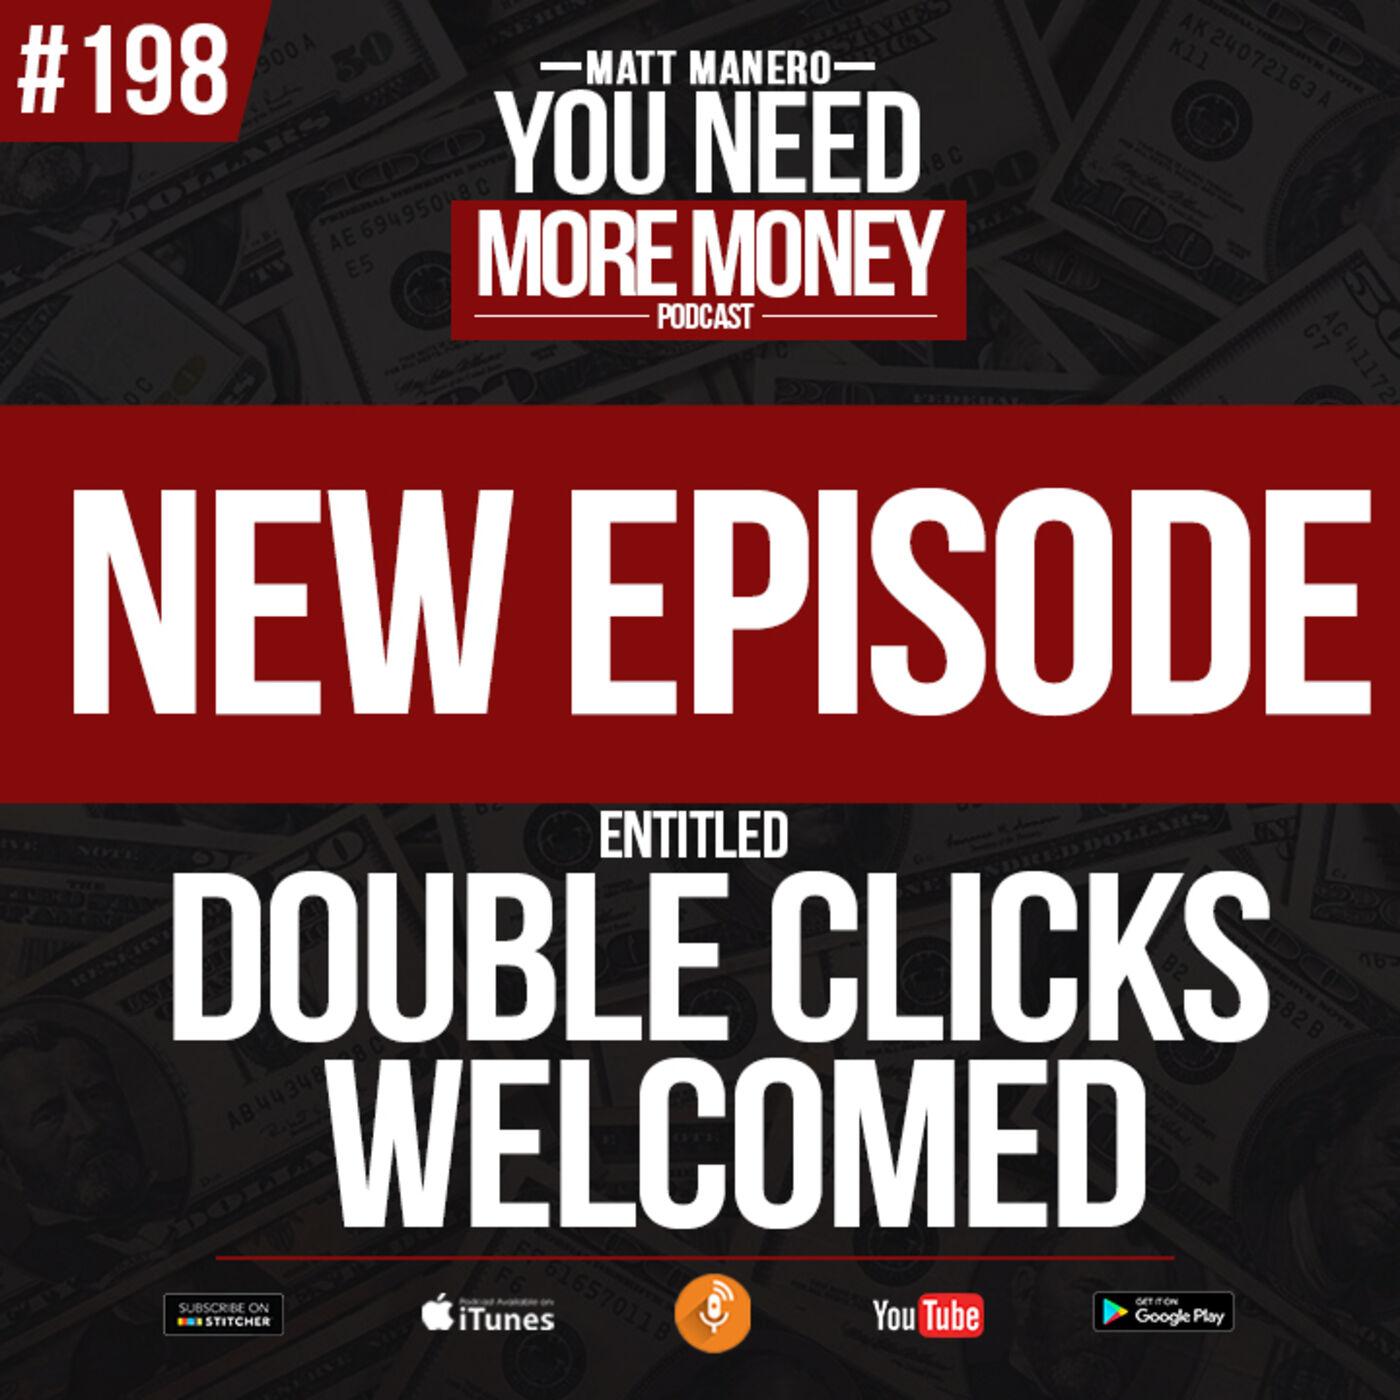 Episode #198 DOUBLE CLICKS WELCOMED with Matt Manero